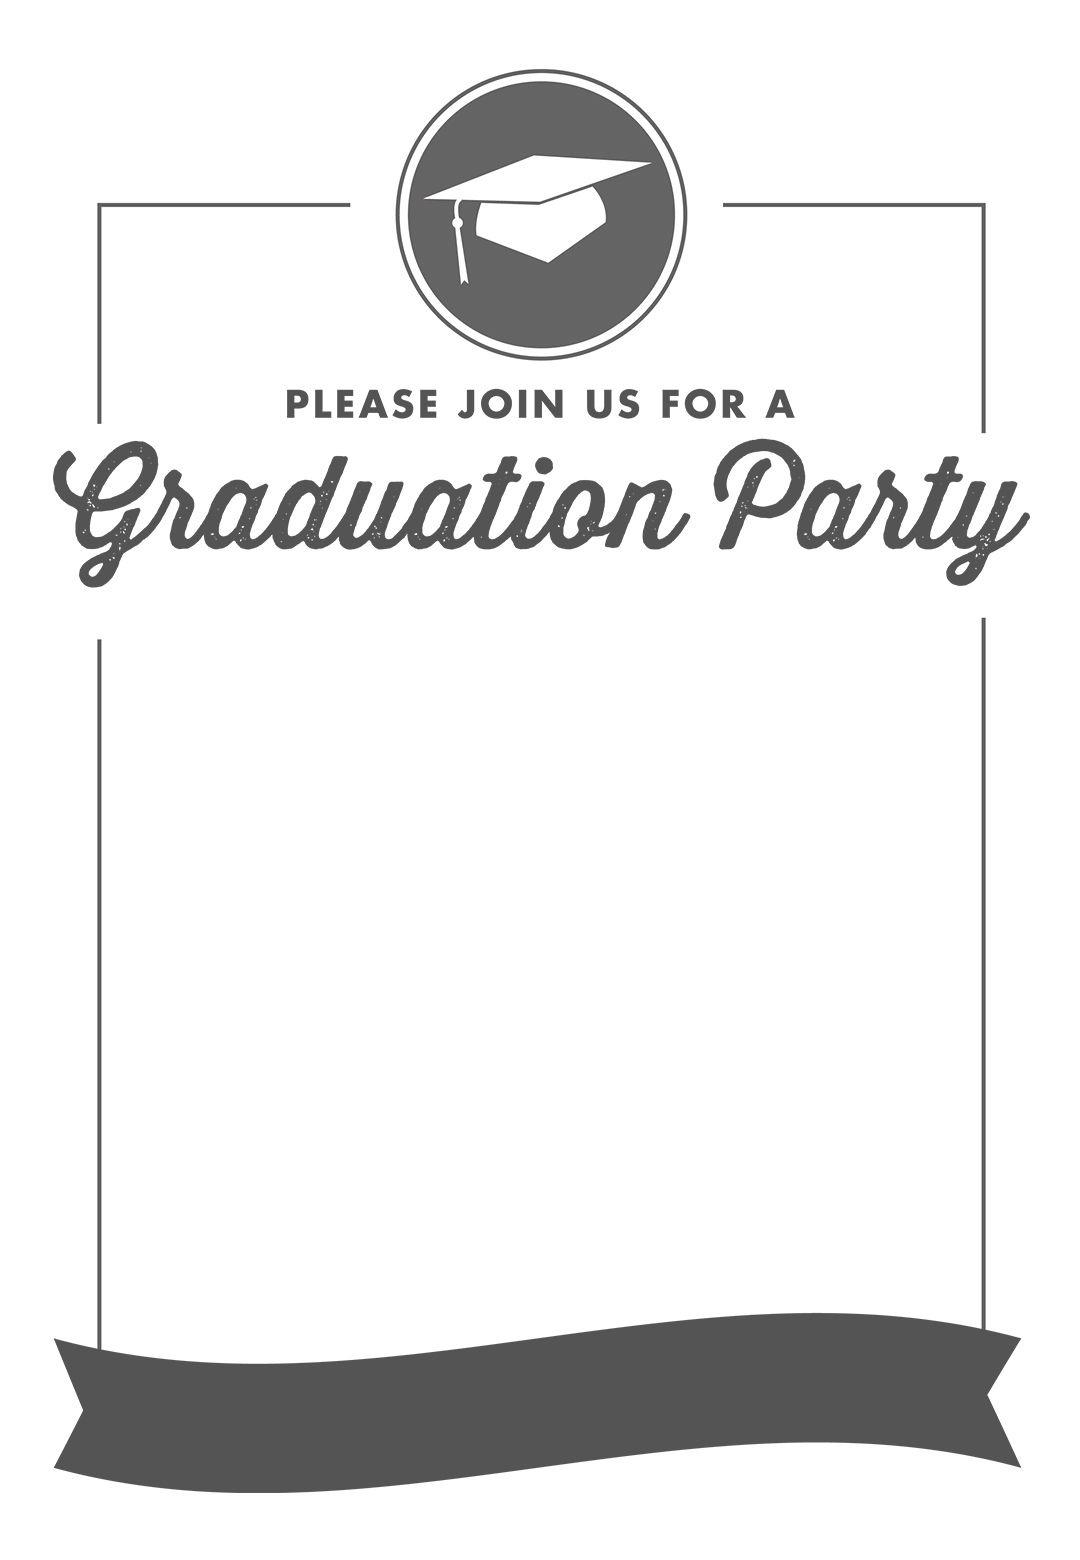 Free Printable Graduation Party Invitation Template   Greetings - Free Printable Graduation Party Invitations 2014